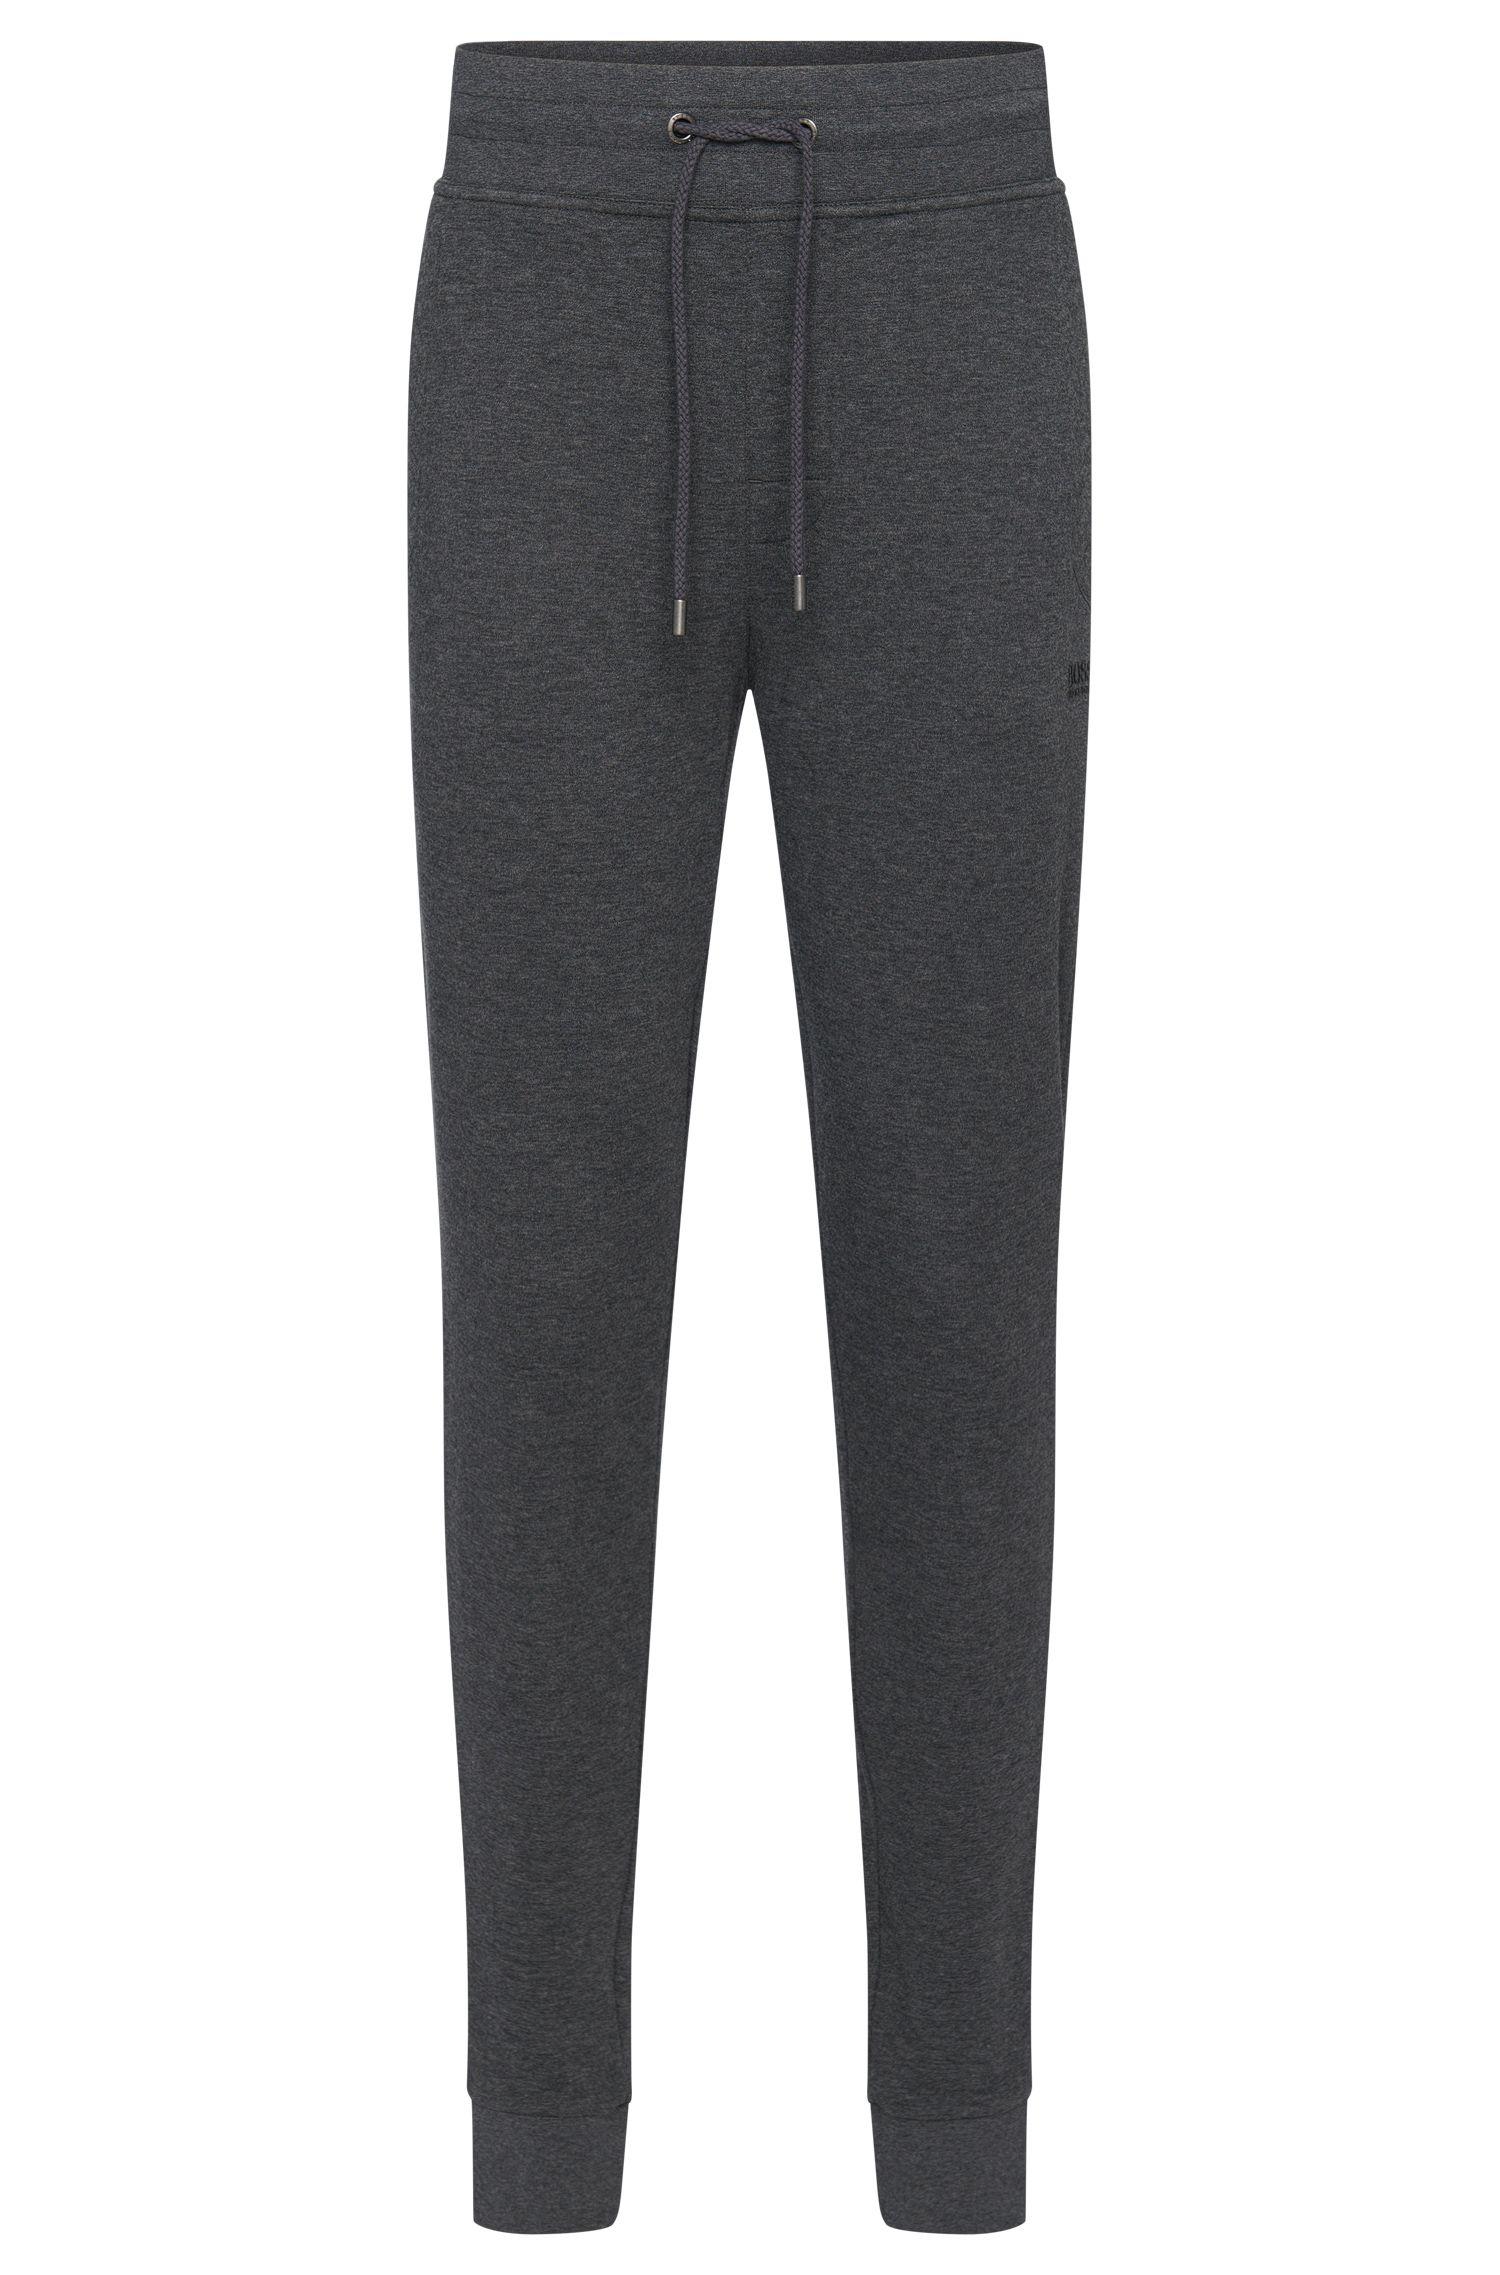 Cotton Drawstring Sweat Pant | Long Pant Cuffs